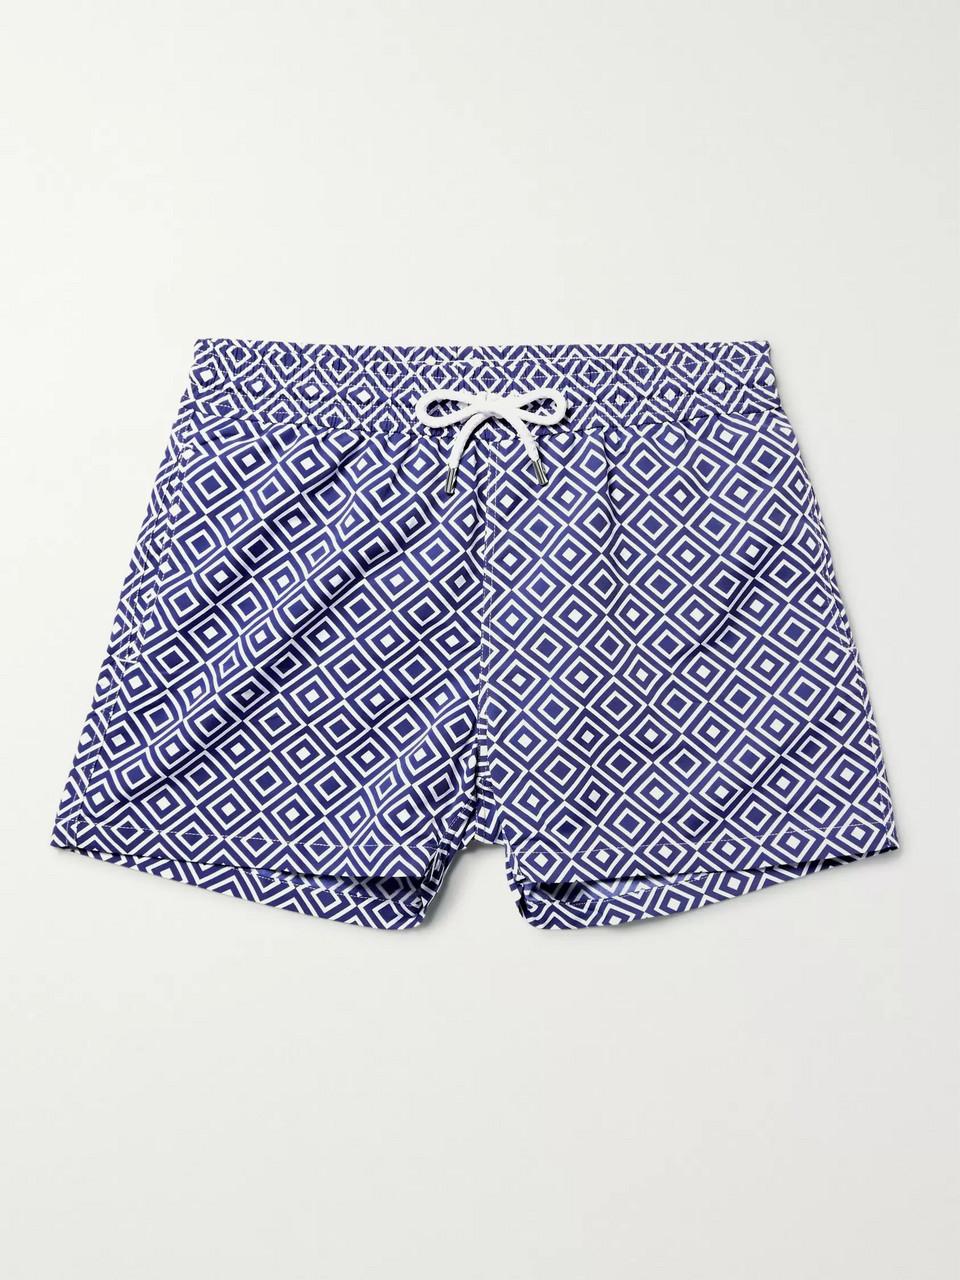 fba68fa6b4 Frescobol Carioca Angra Slim-Fit Short-Length Printed Swim Shorts